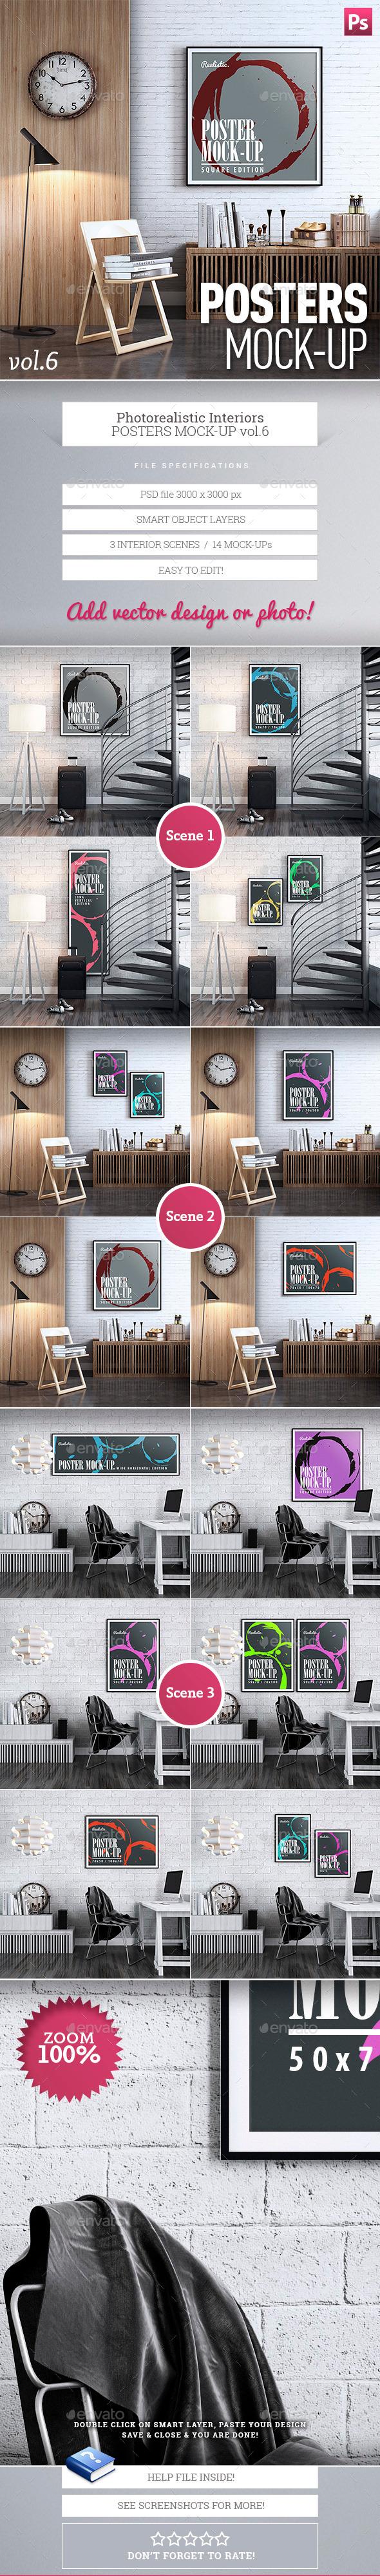 Posters Mock-Up vol.6 - Product Mock-Ups Graphics